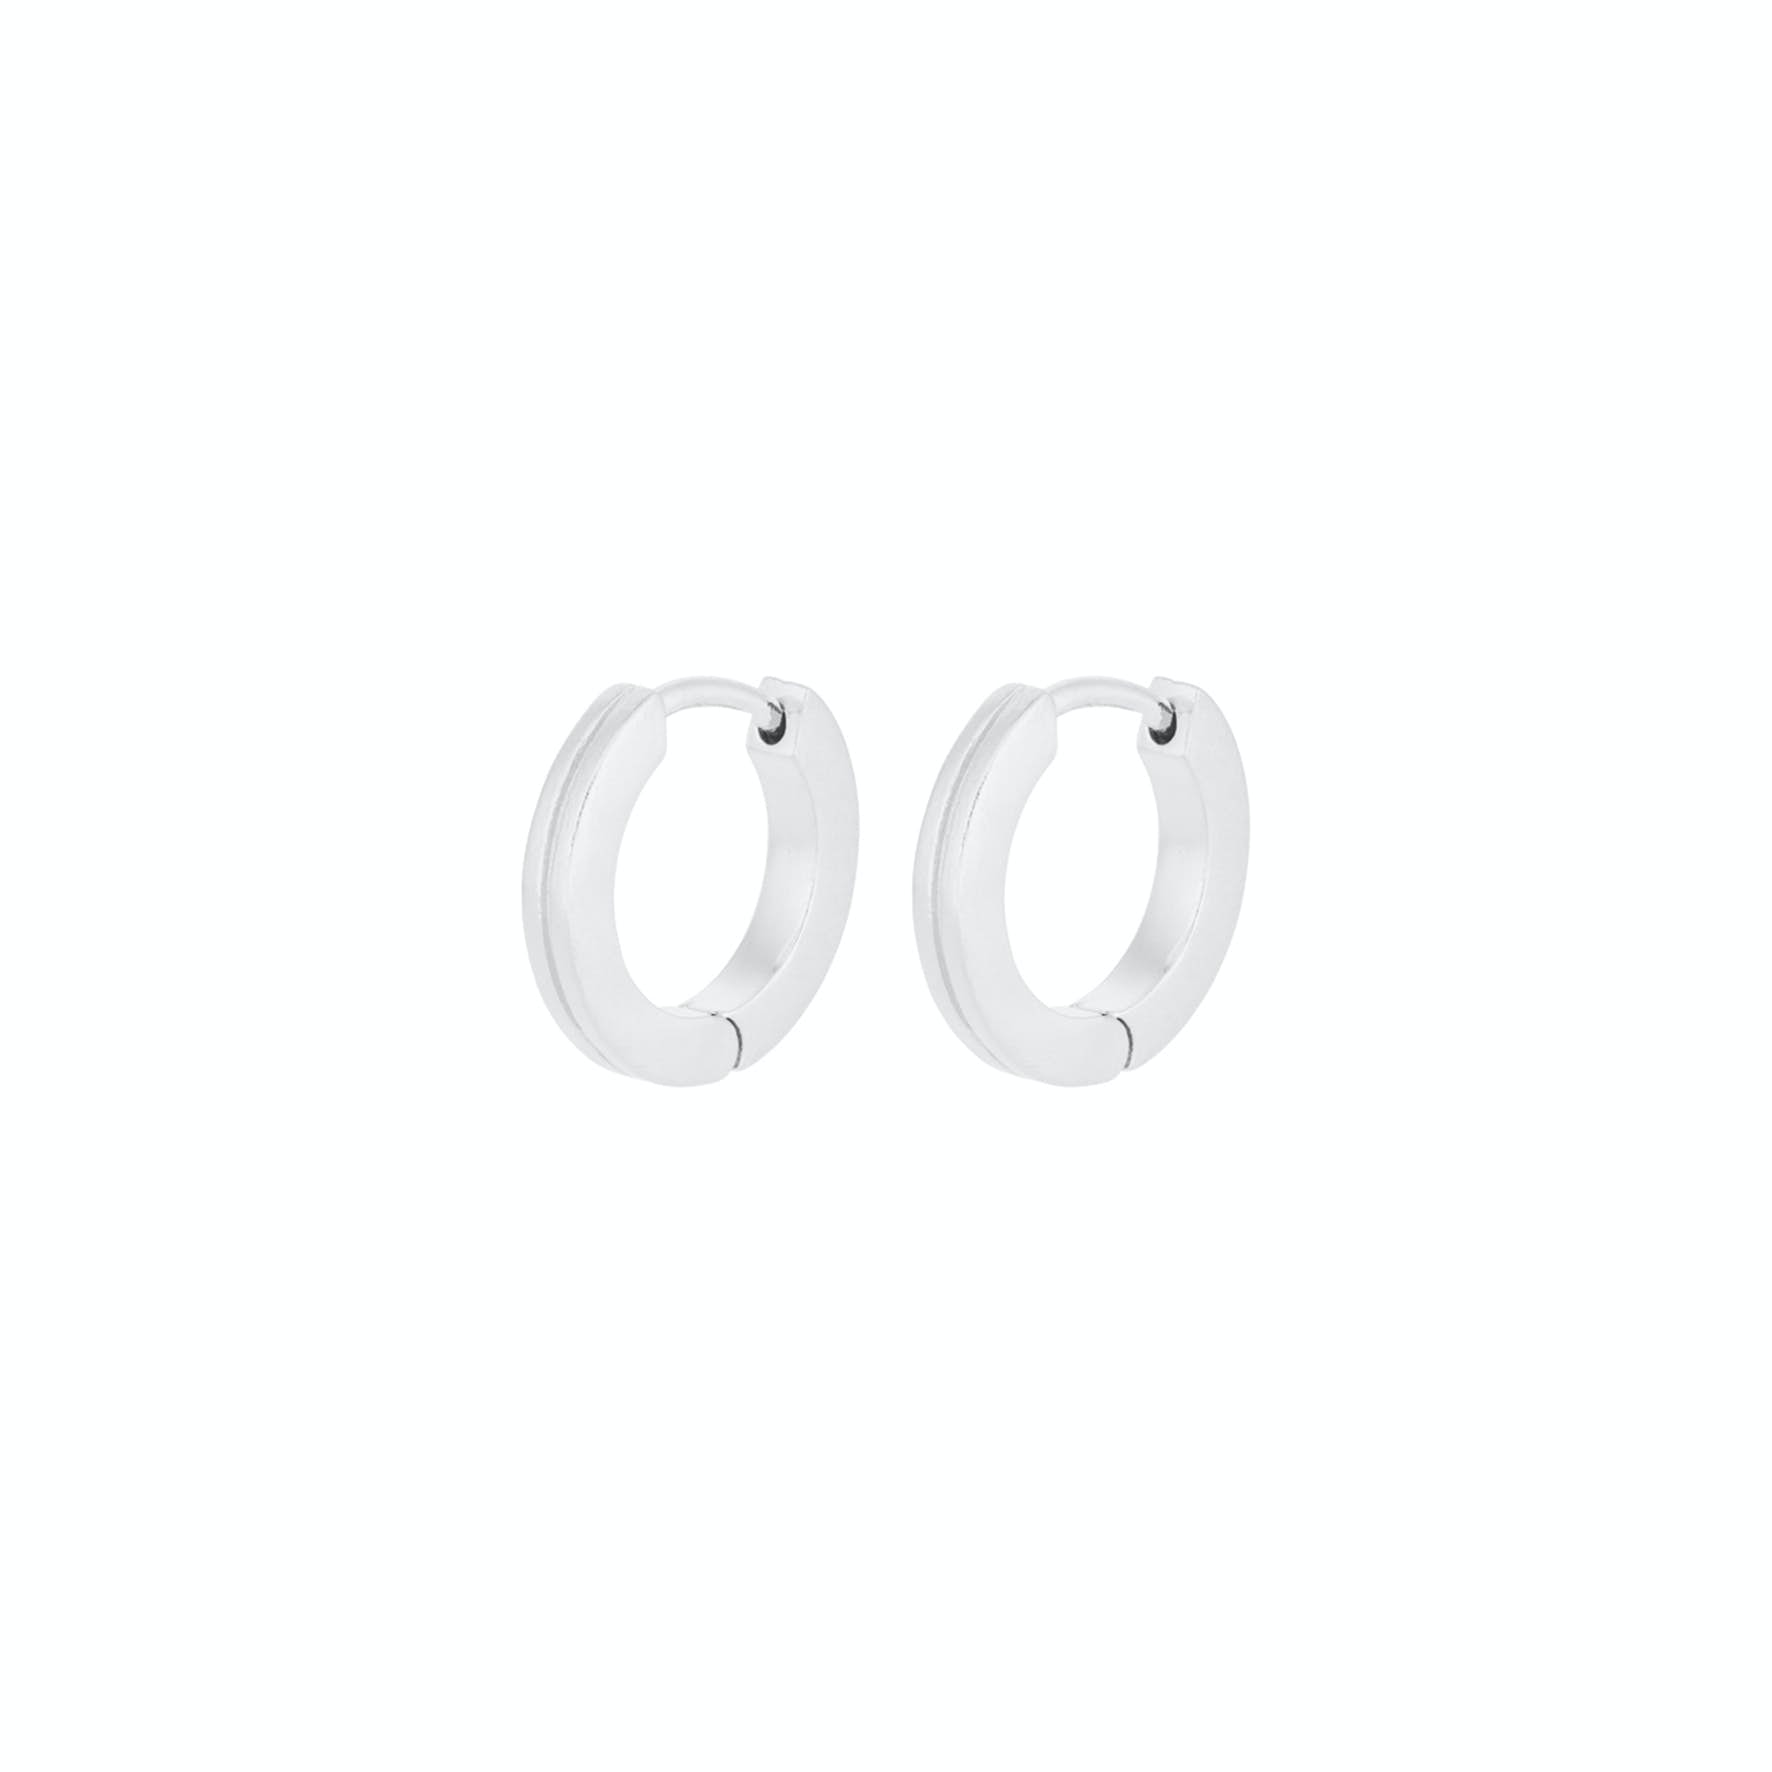 Eddie Huggie Earrings from Pernille Corydon in Silver Sterling 925